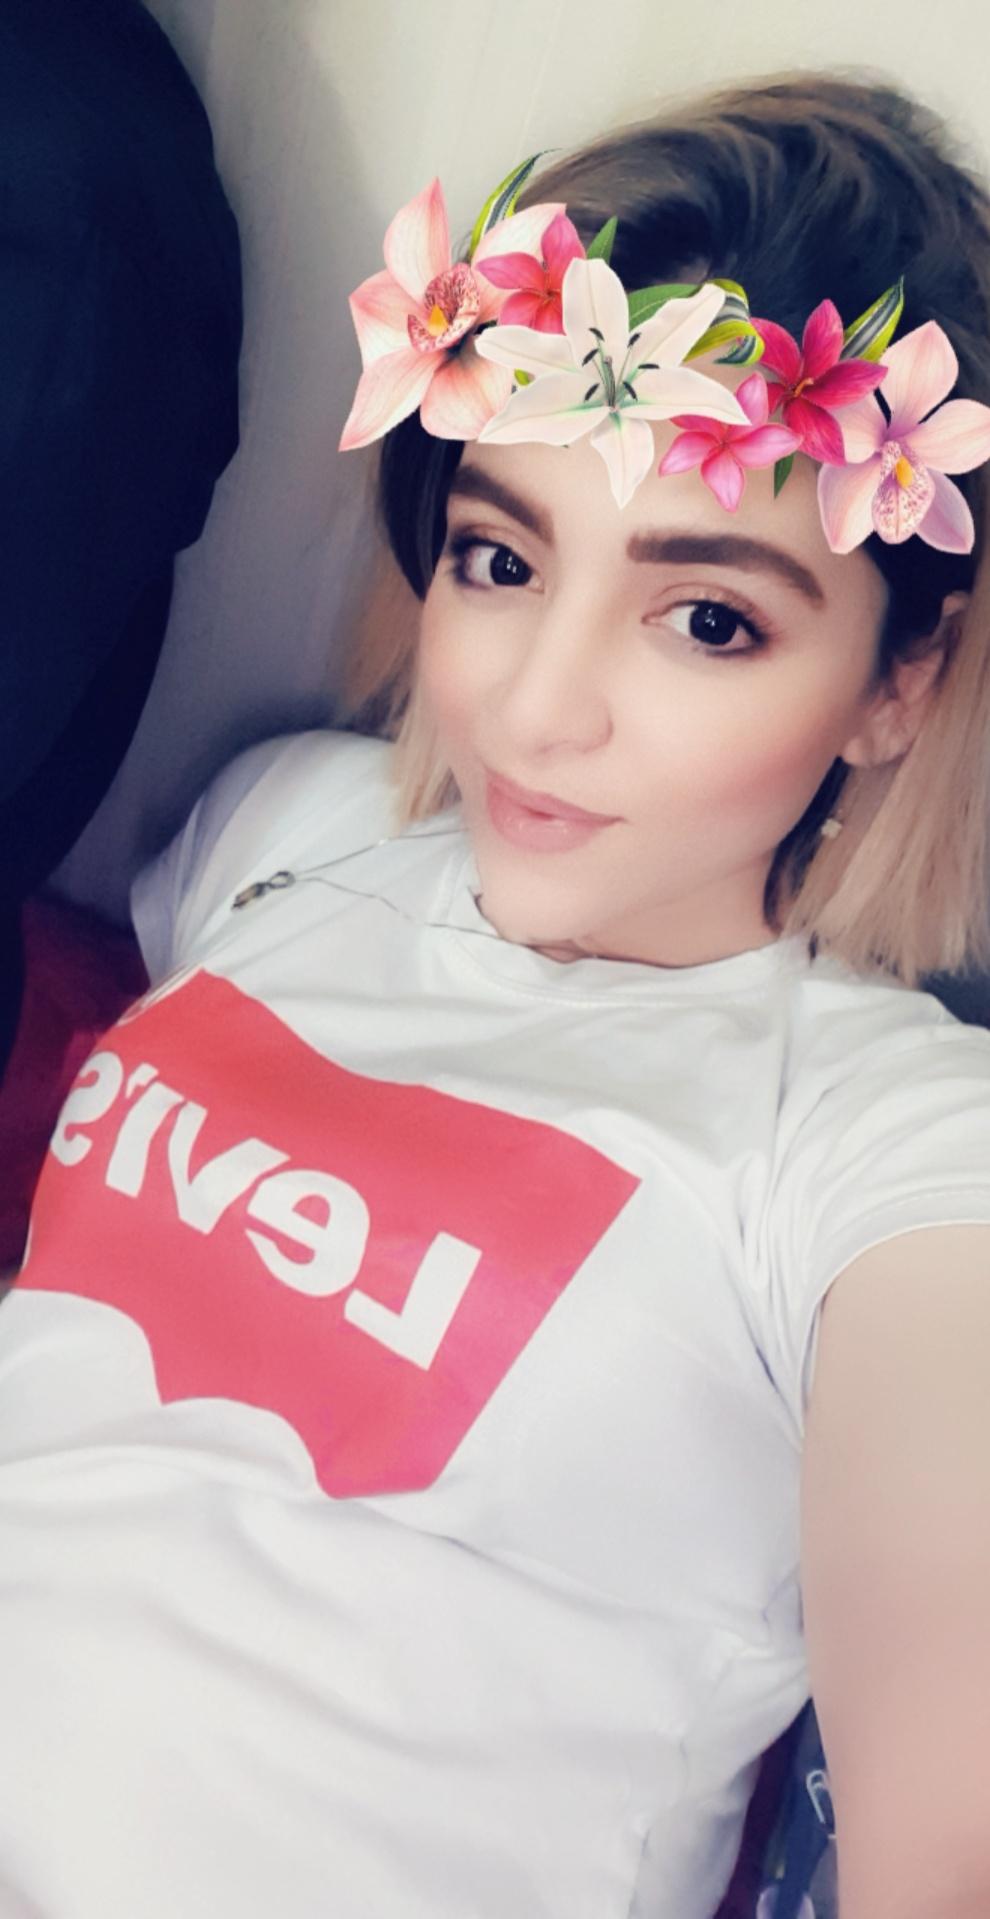 ملیکا محمودی